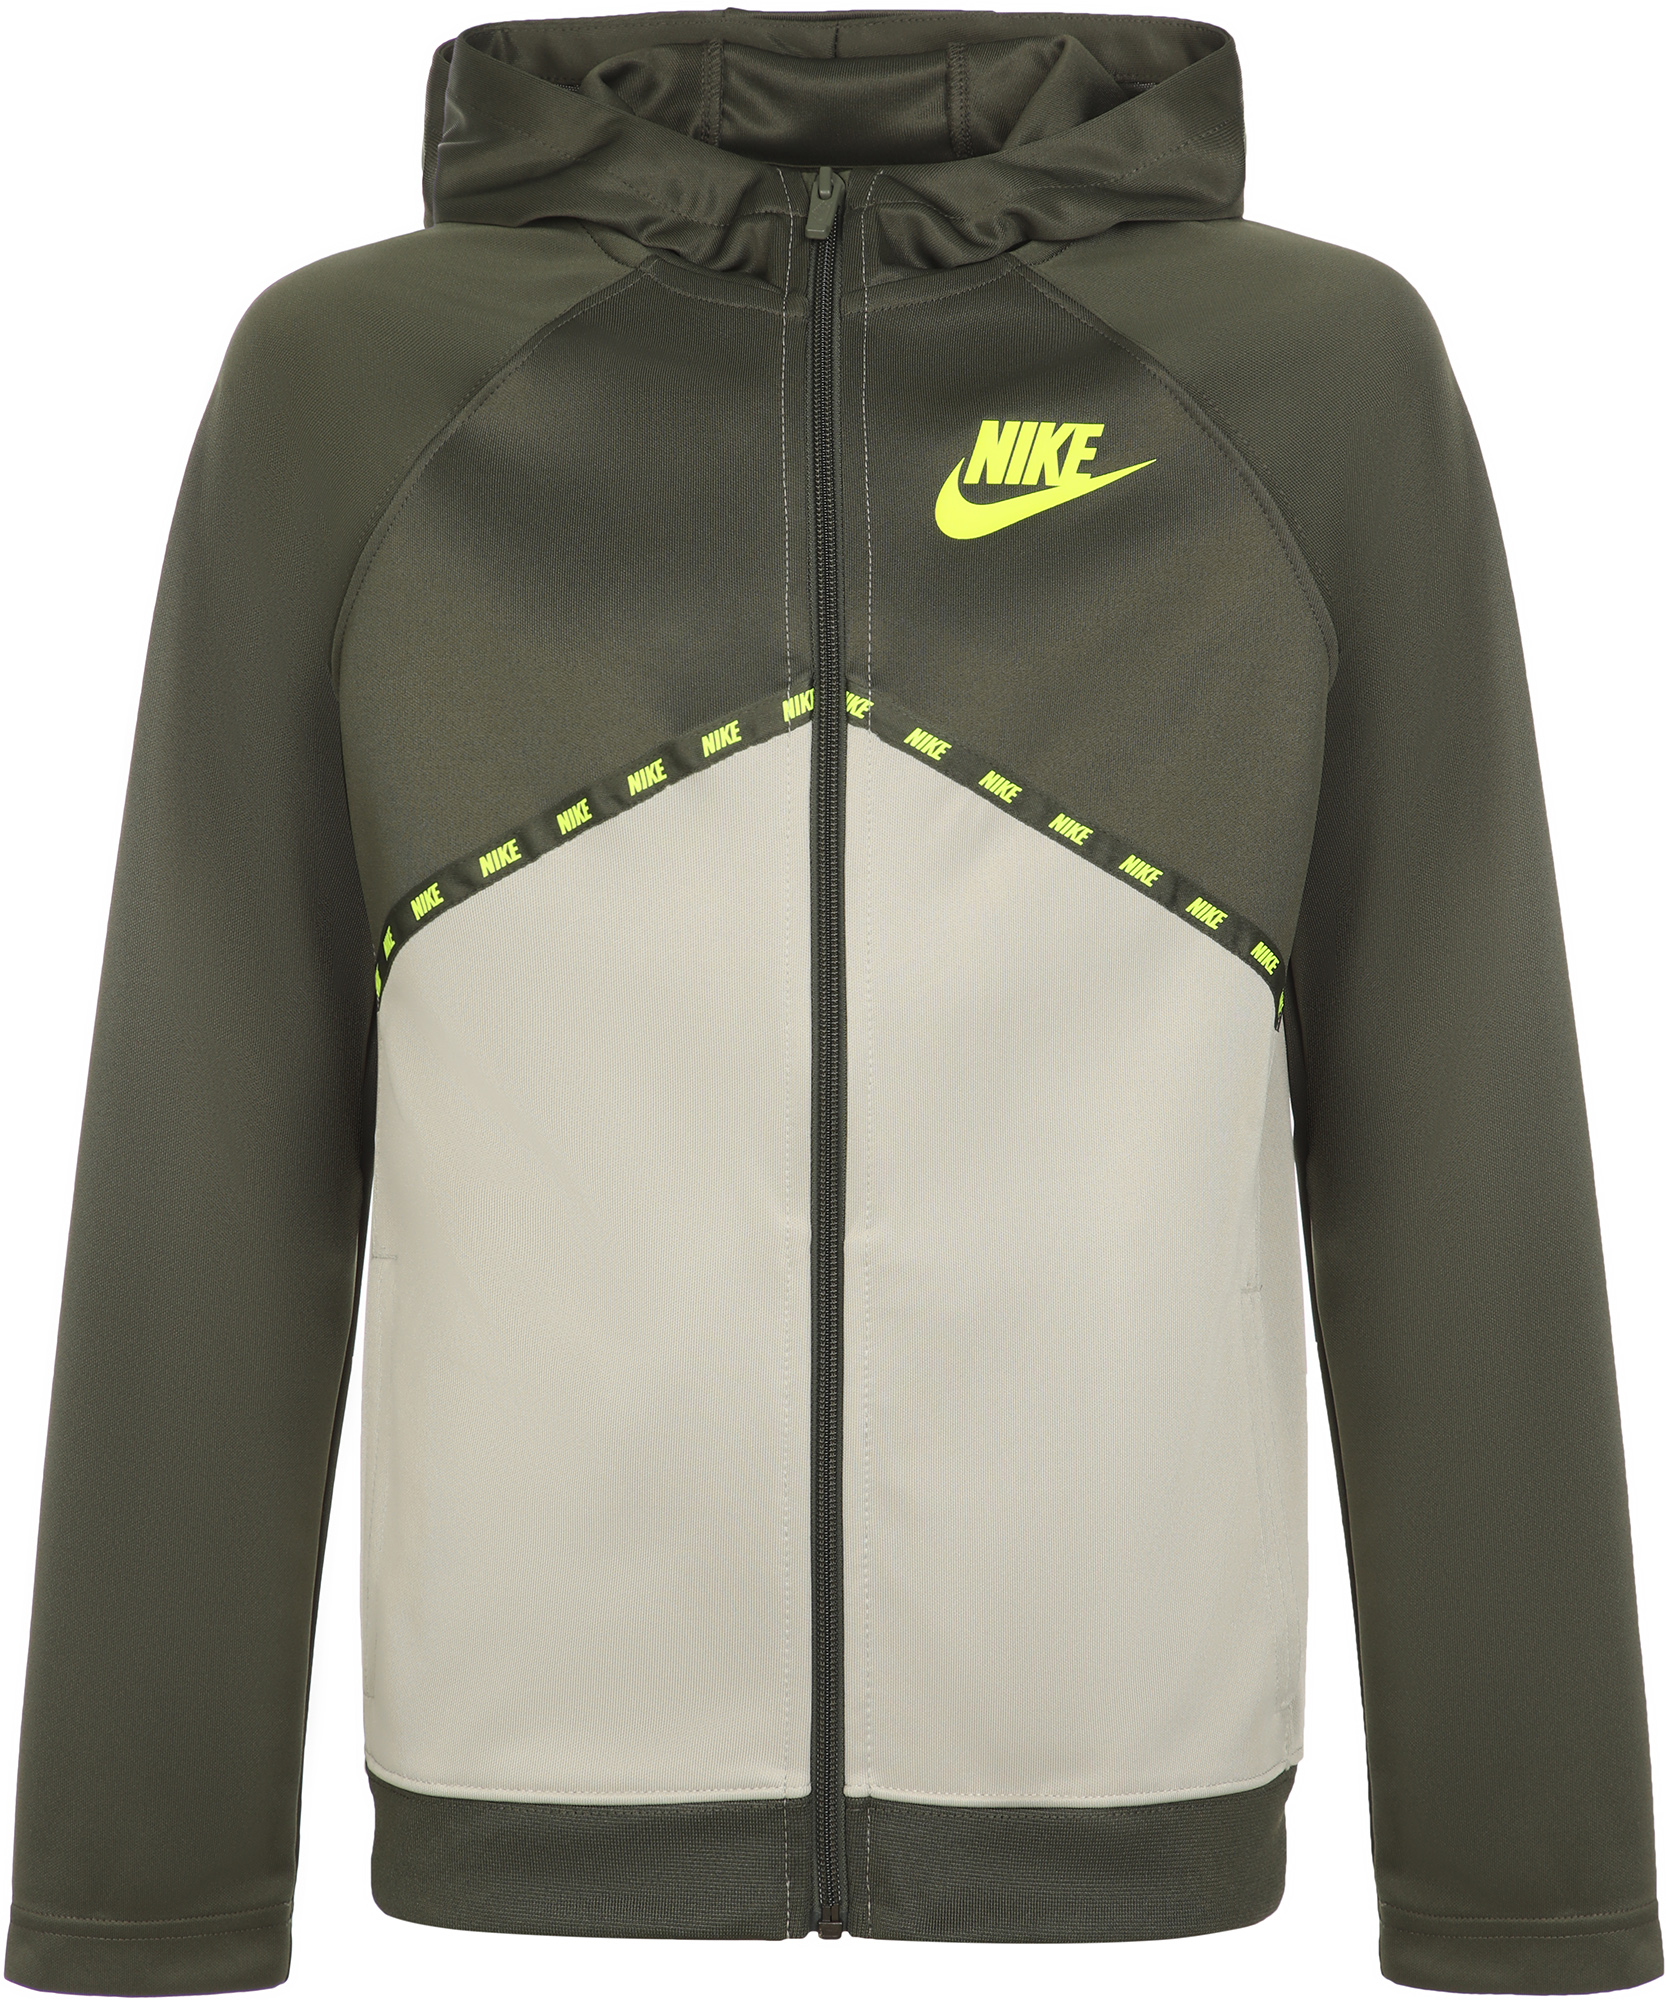 Nike Толстовка для мальчиков Nike Sportswear, размер 137-147